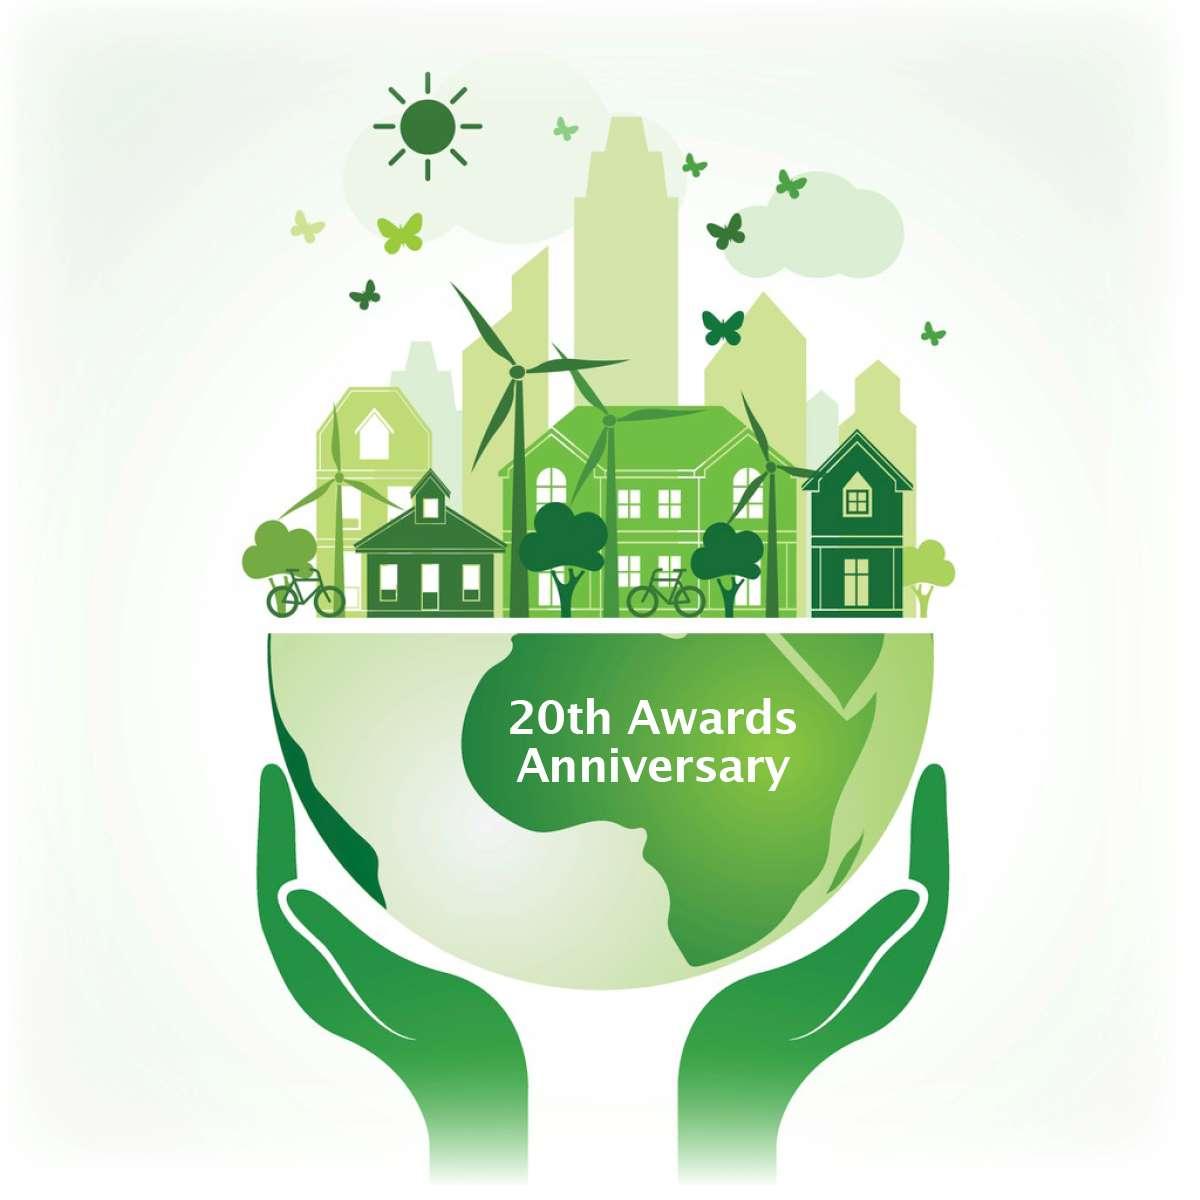 Awards2019_20thAnniversary_Image